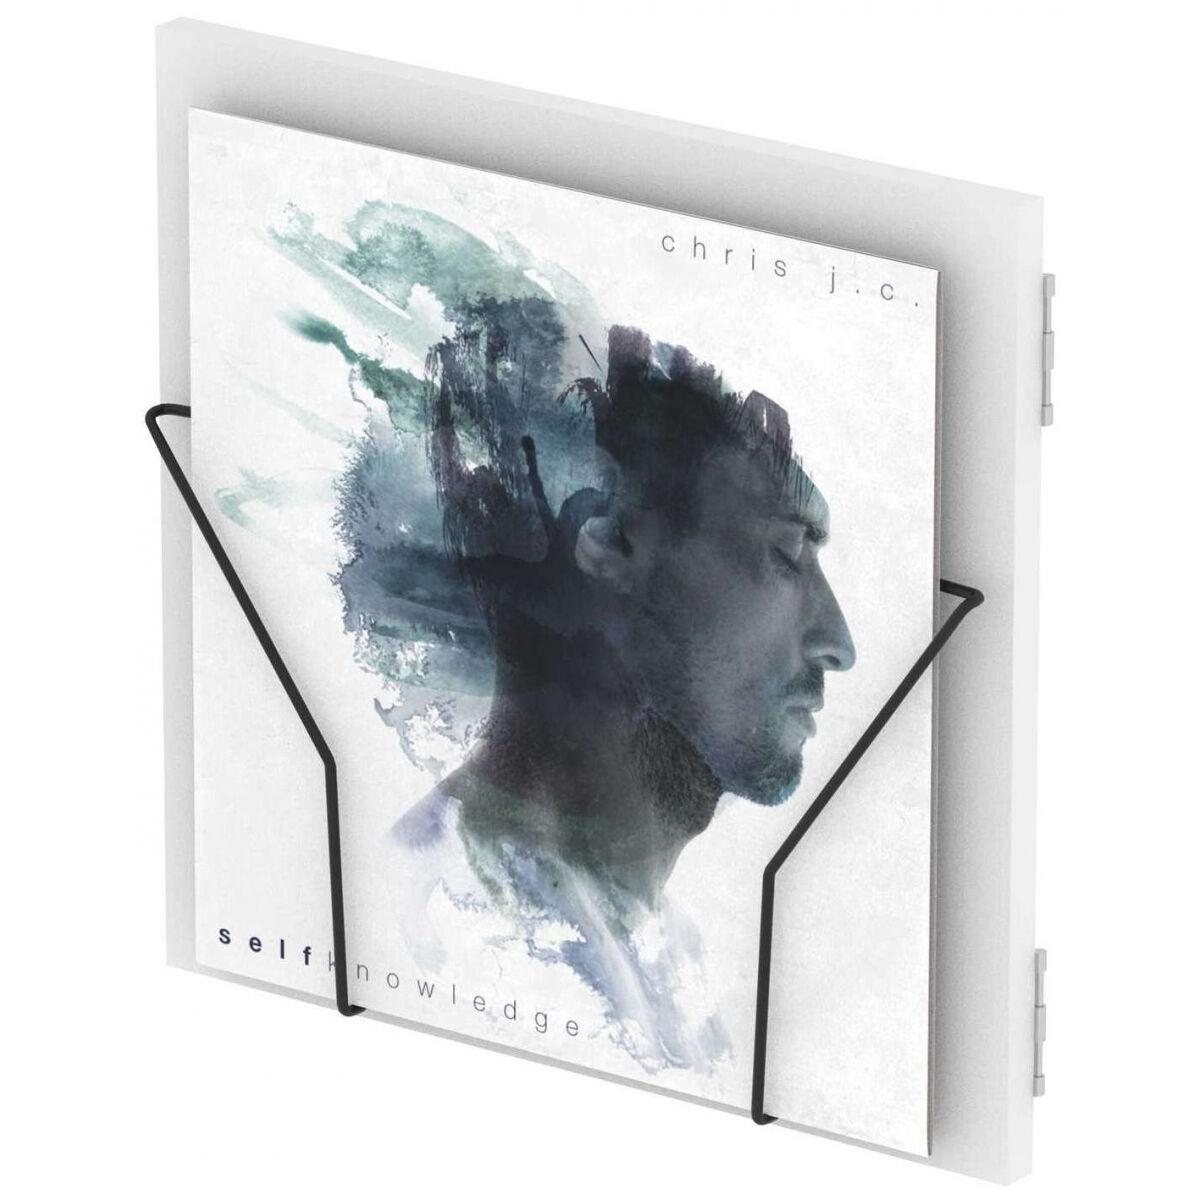 Glorious DJ RECORD BOX DISPLAY DOOR WHITE